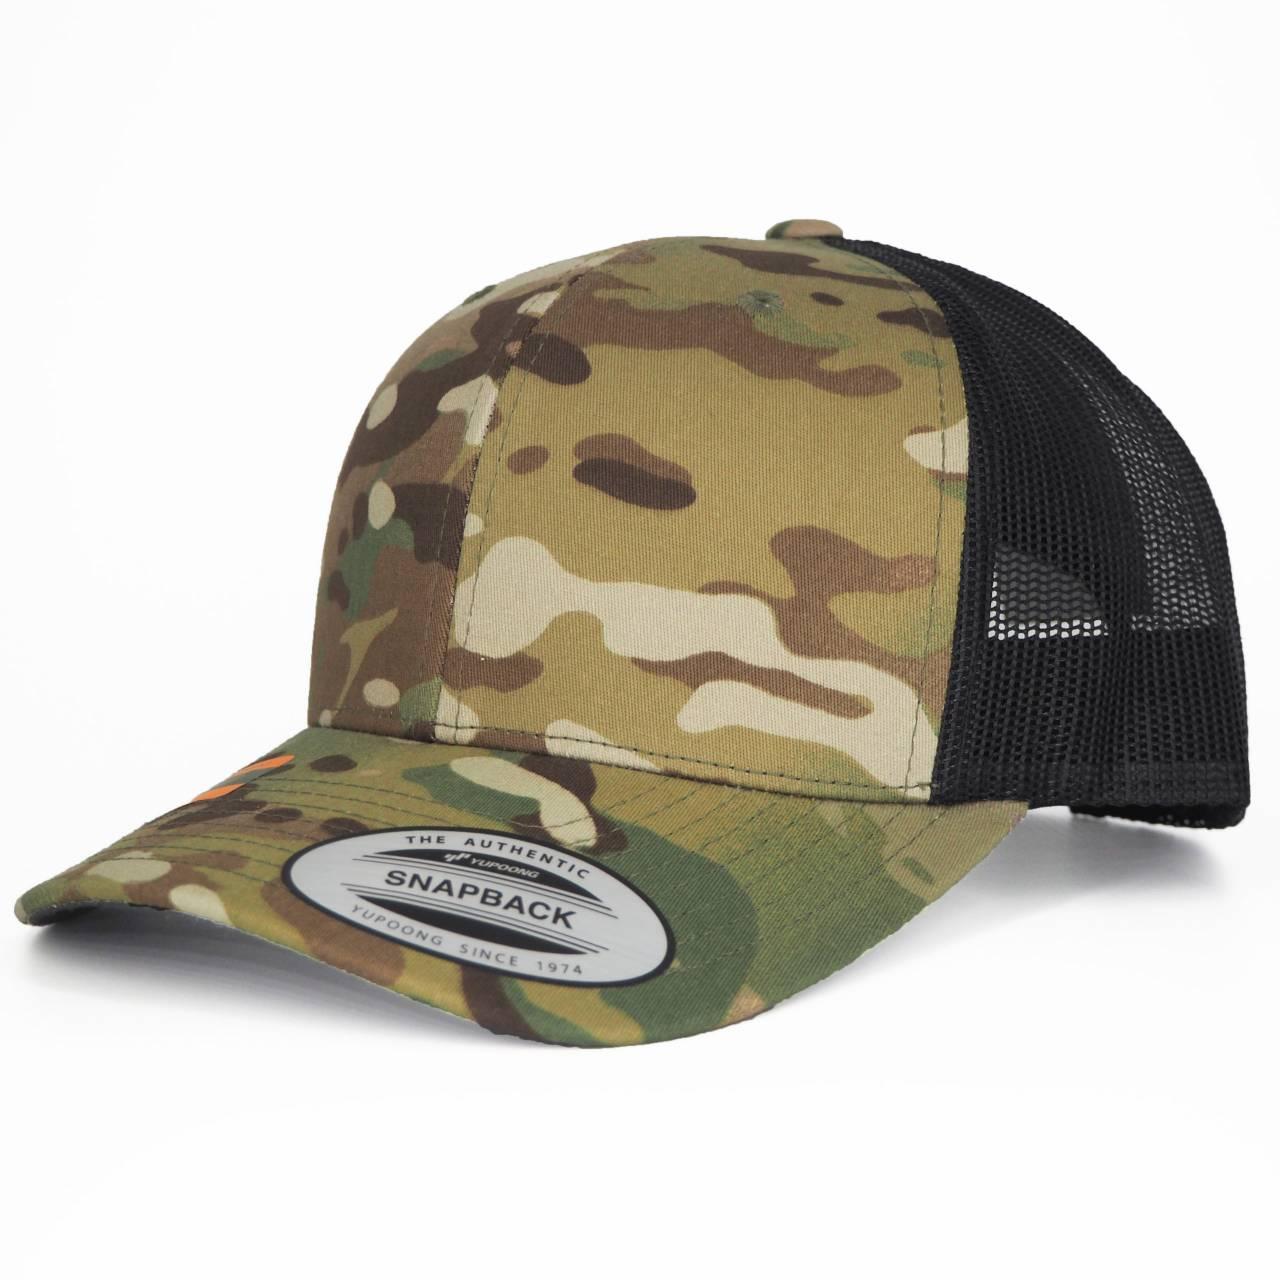 6606MC-01394-0050 RETRO TRUCKER WOODLAND MULTICAMO CAP